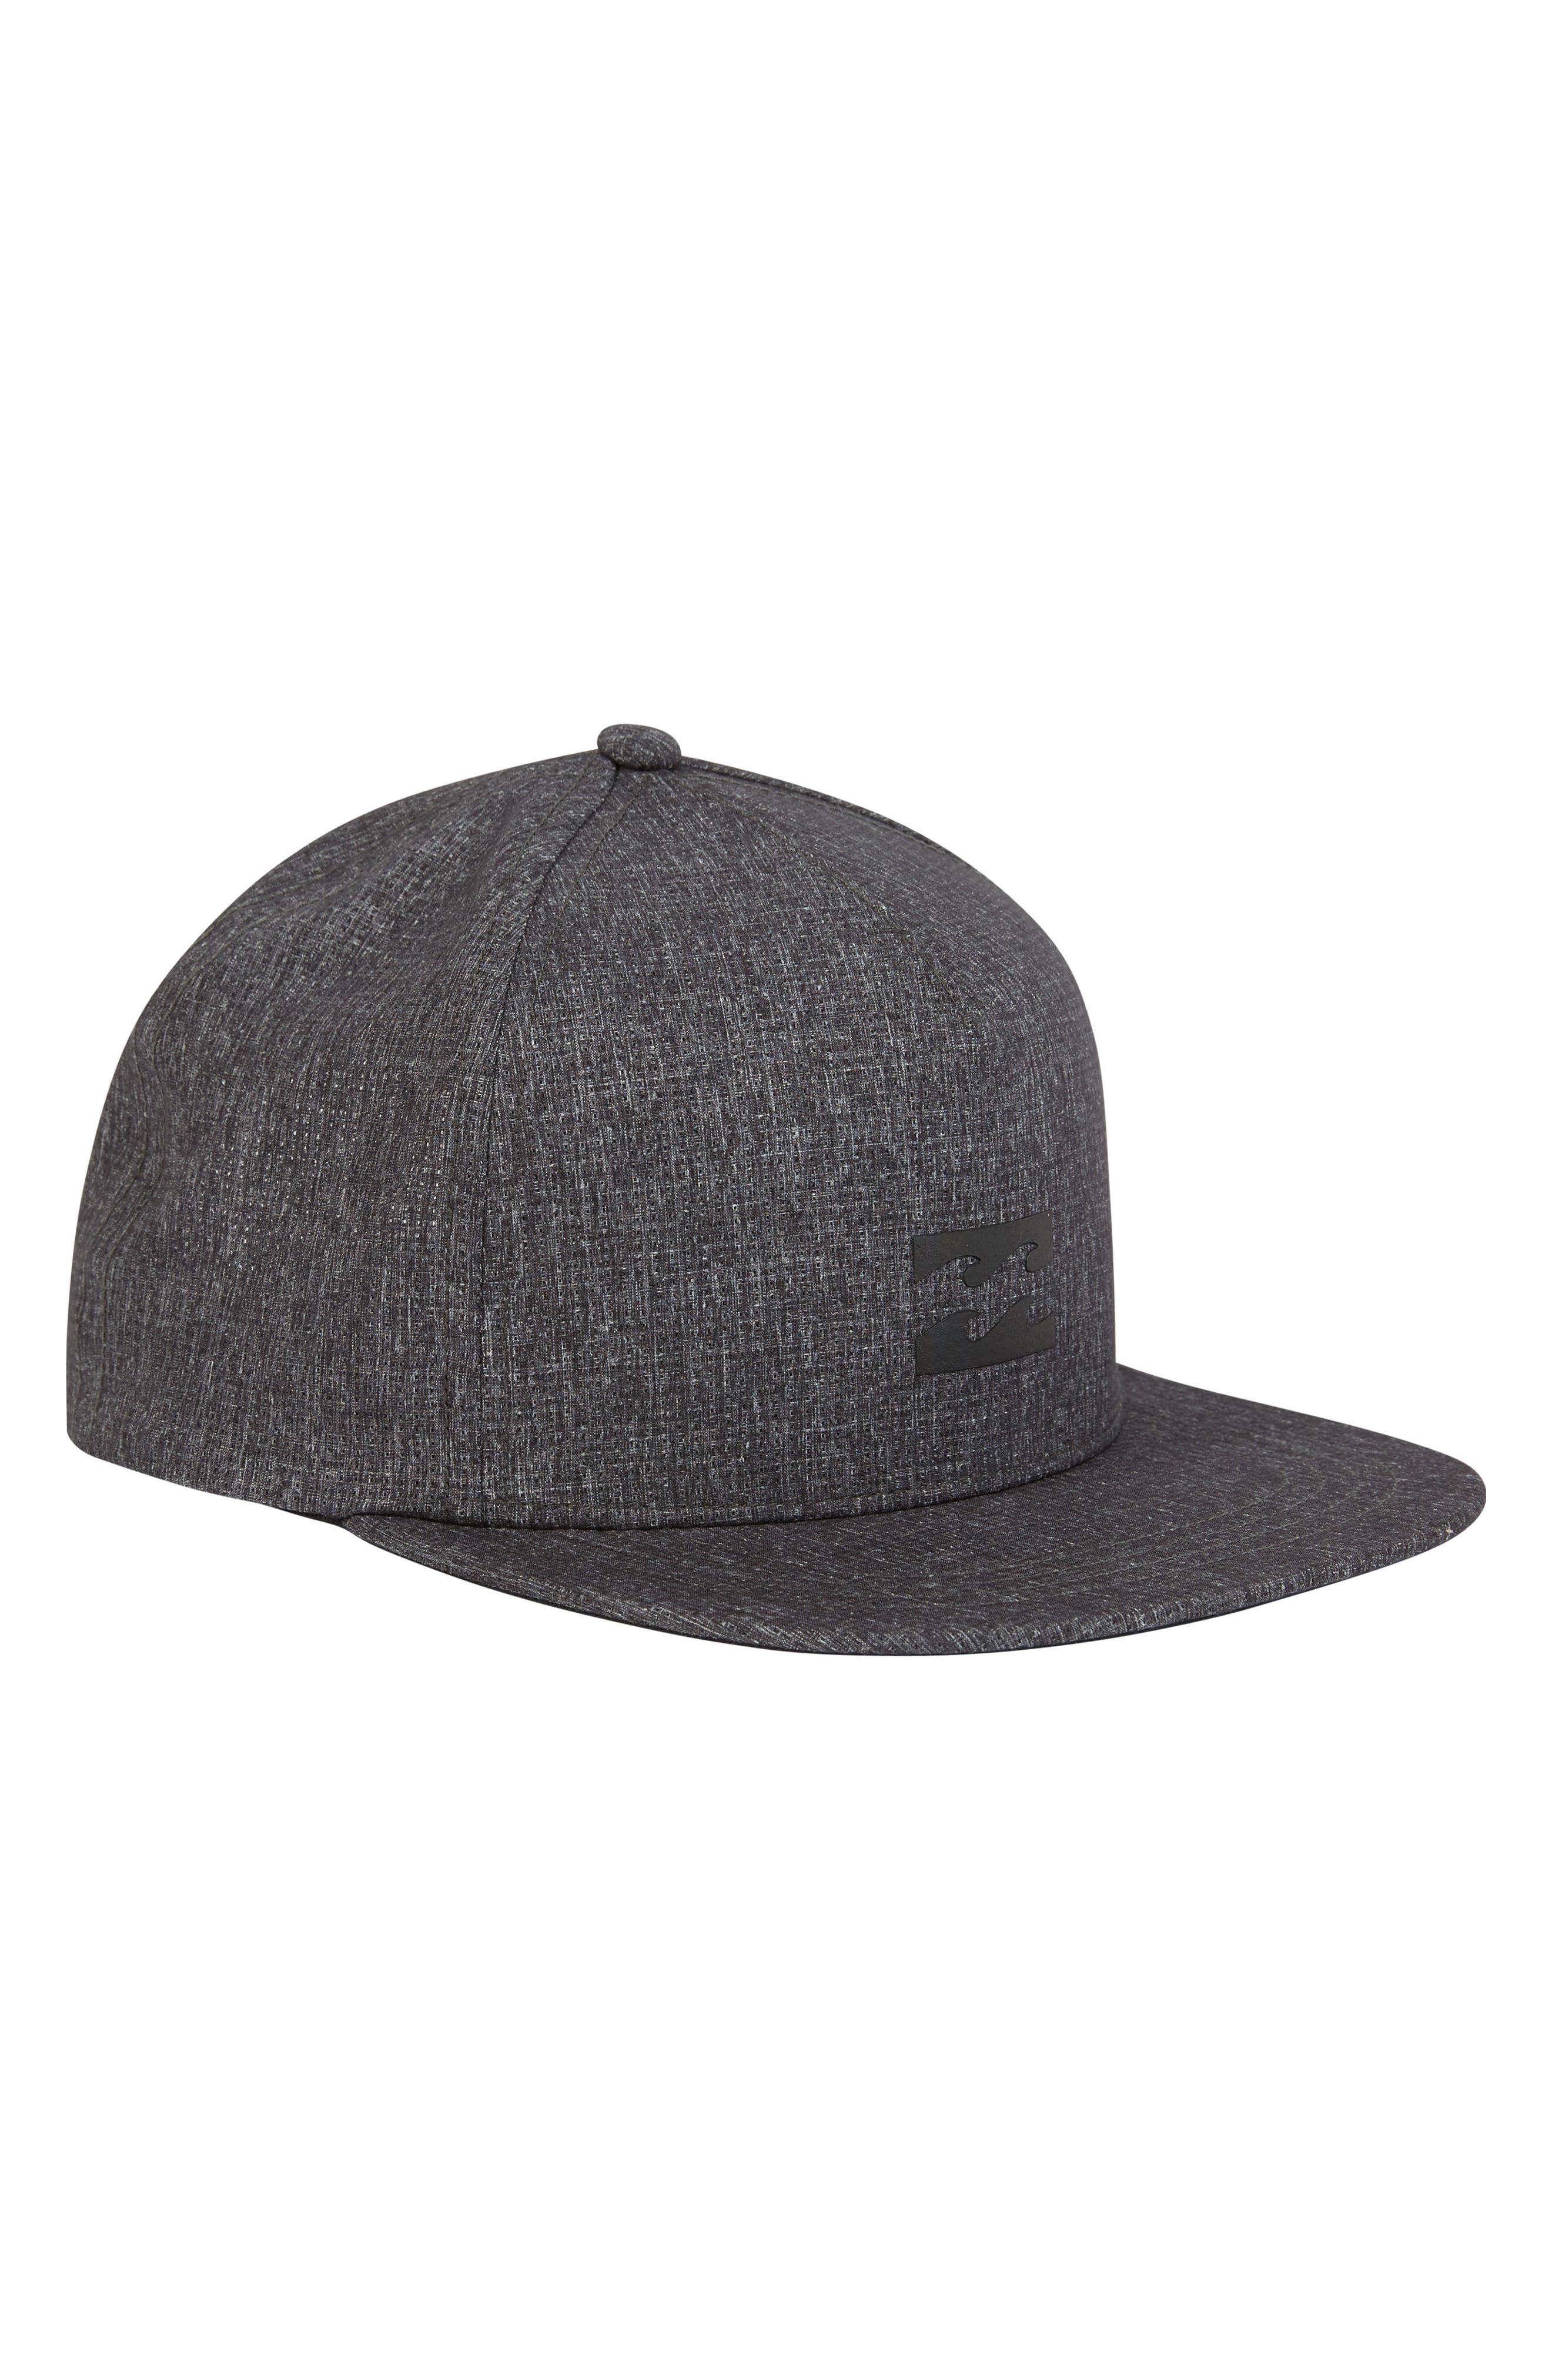 Surftrek Trucker Hat,                             Main thumbnail 1, color,                             BLACK HEATHER